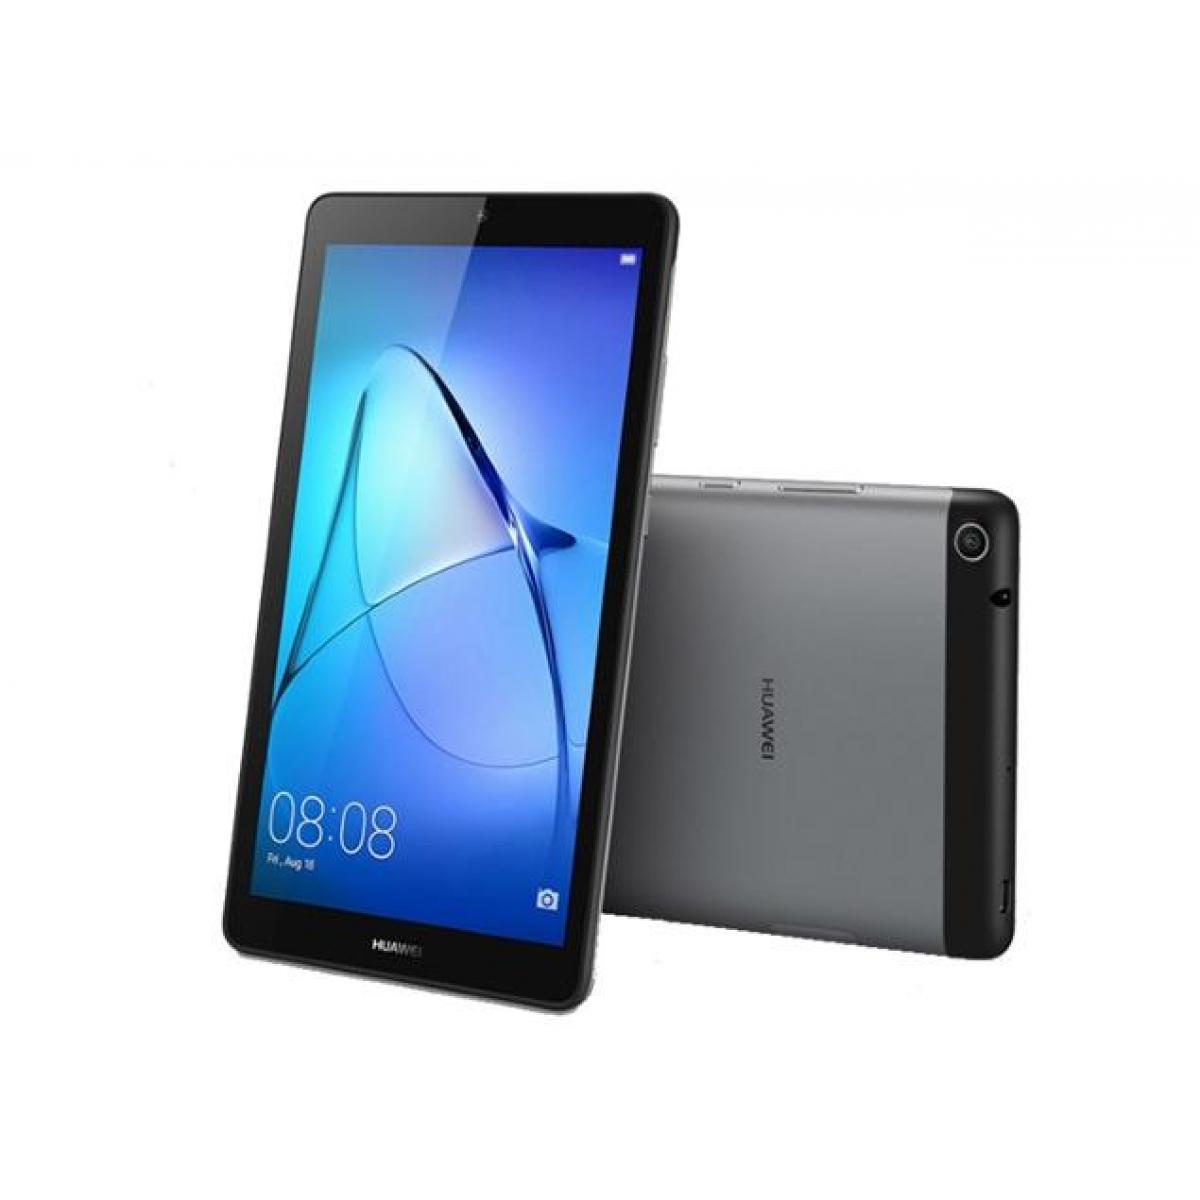 Huawei MediaPad T3 7.0 | GTS - Amman Jordan